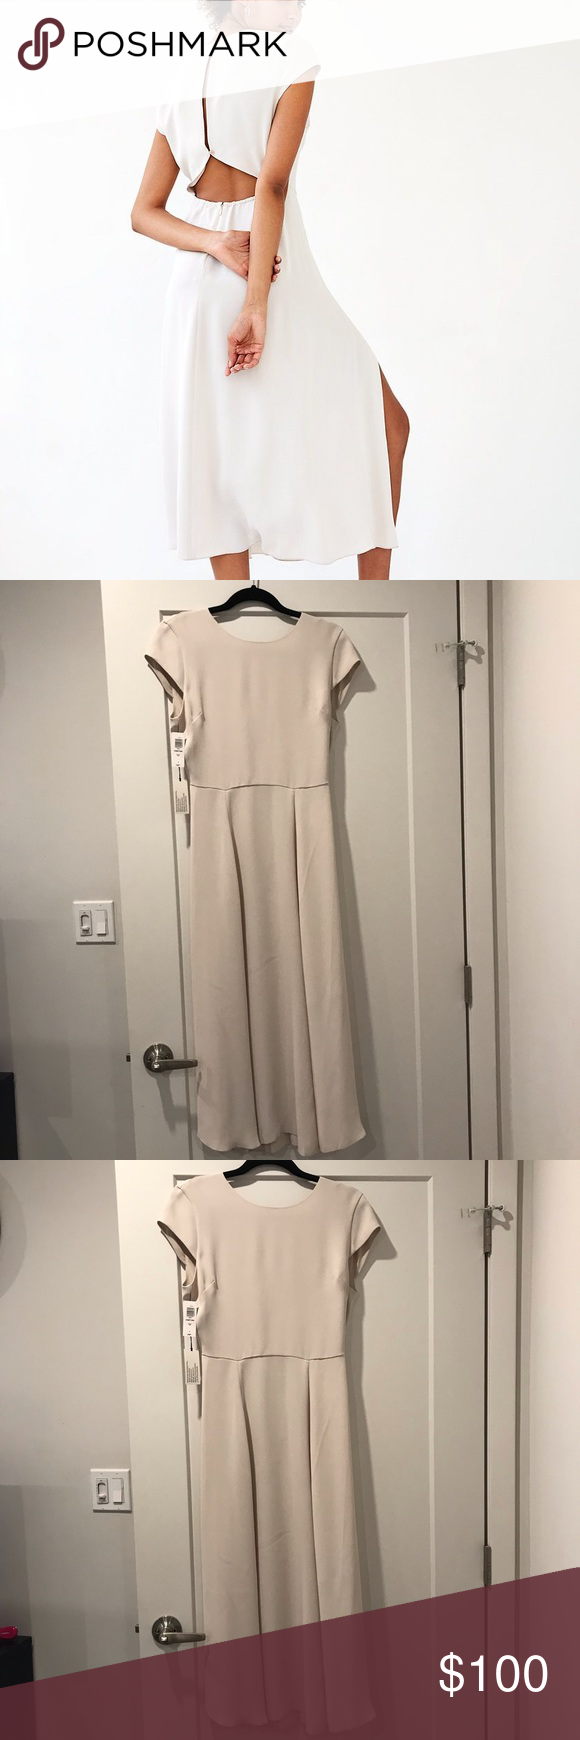 12+ Babaton slit slip dress ideas in 2021